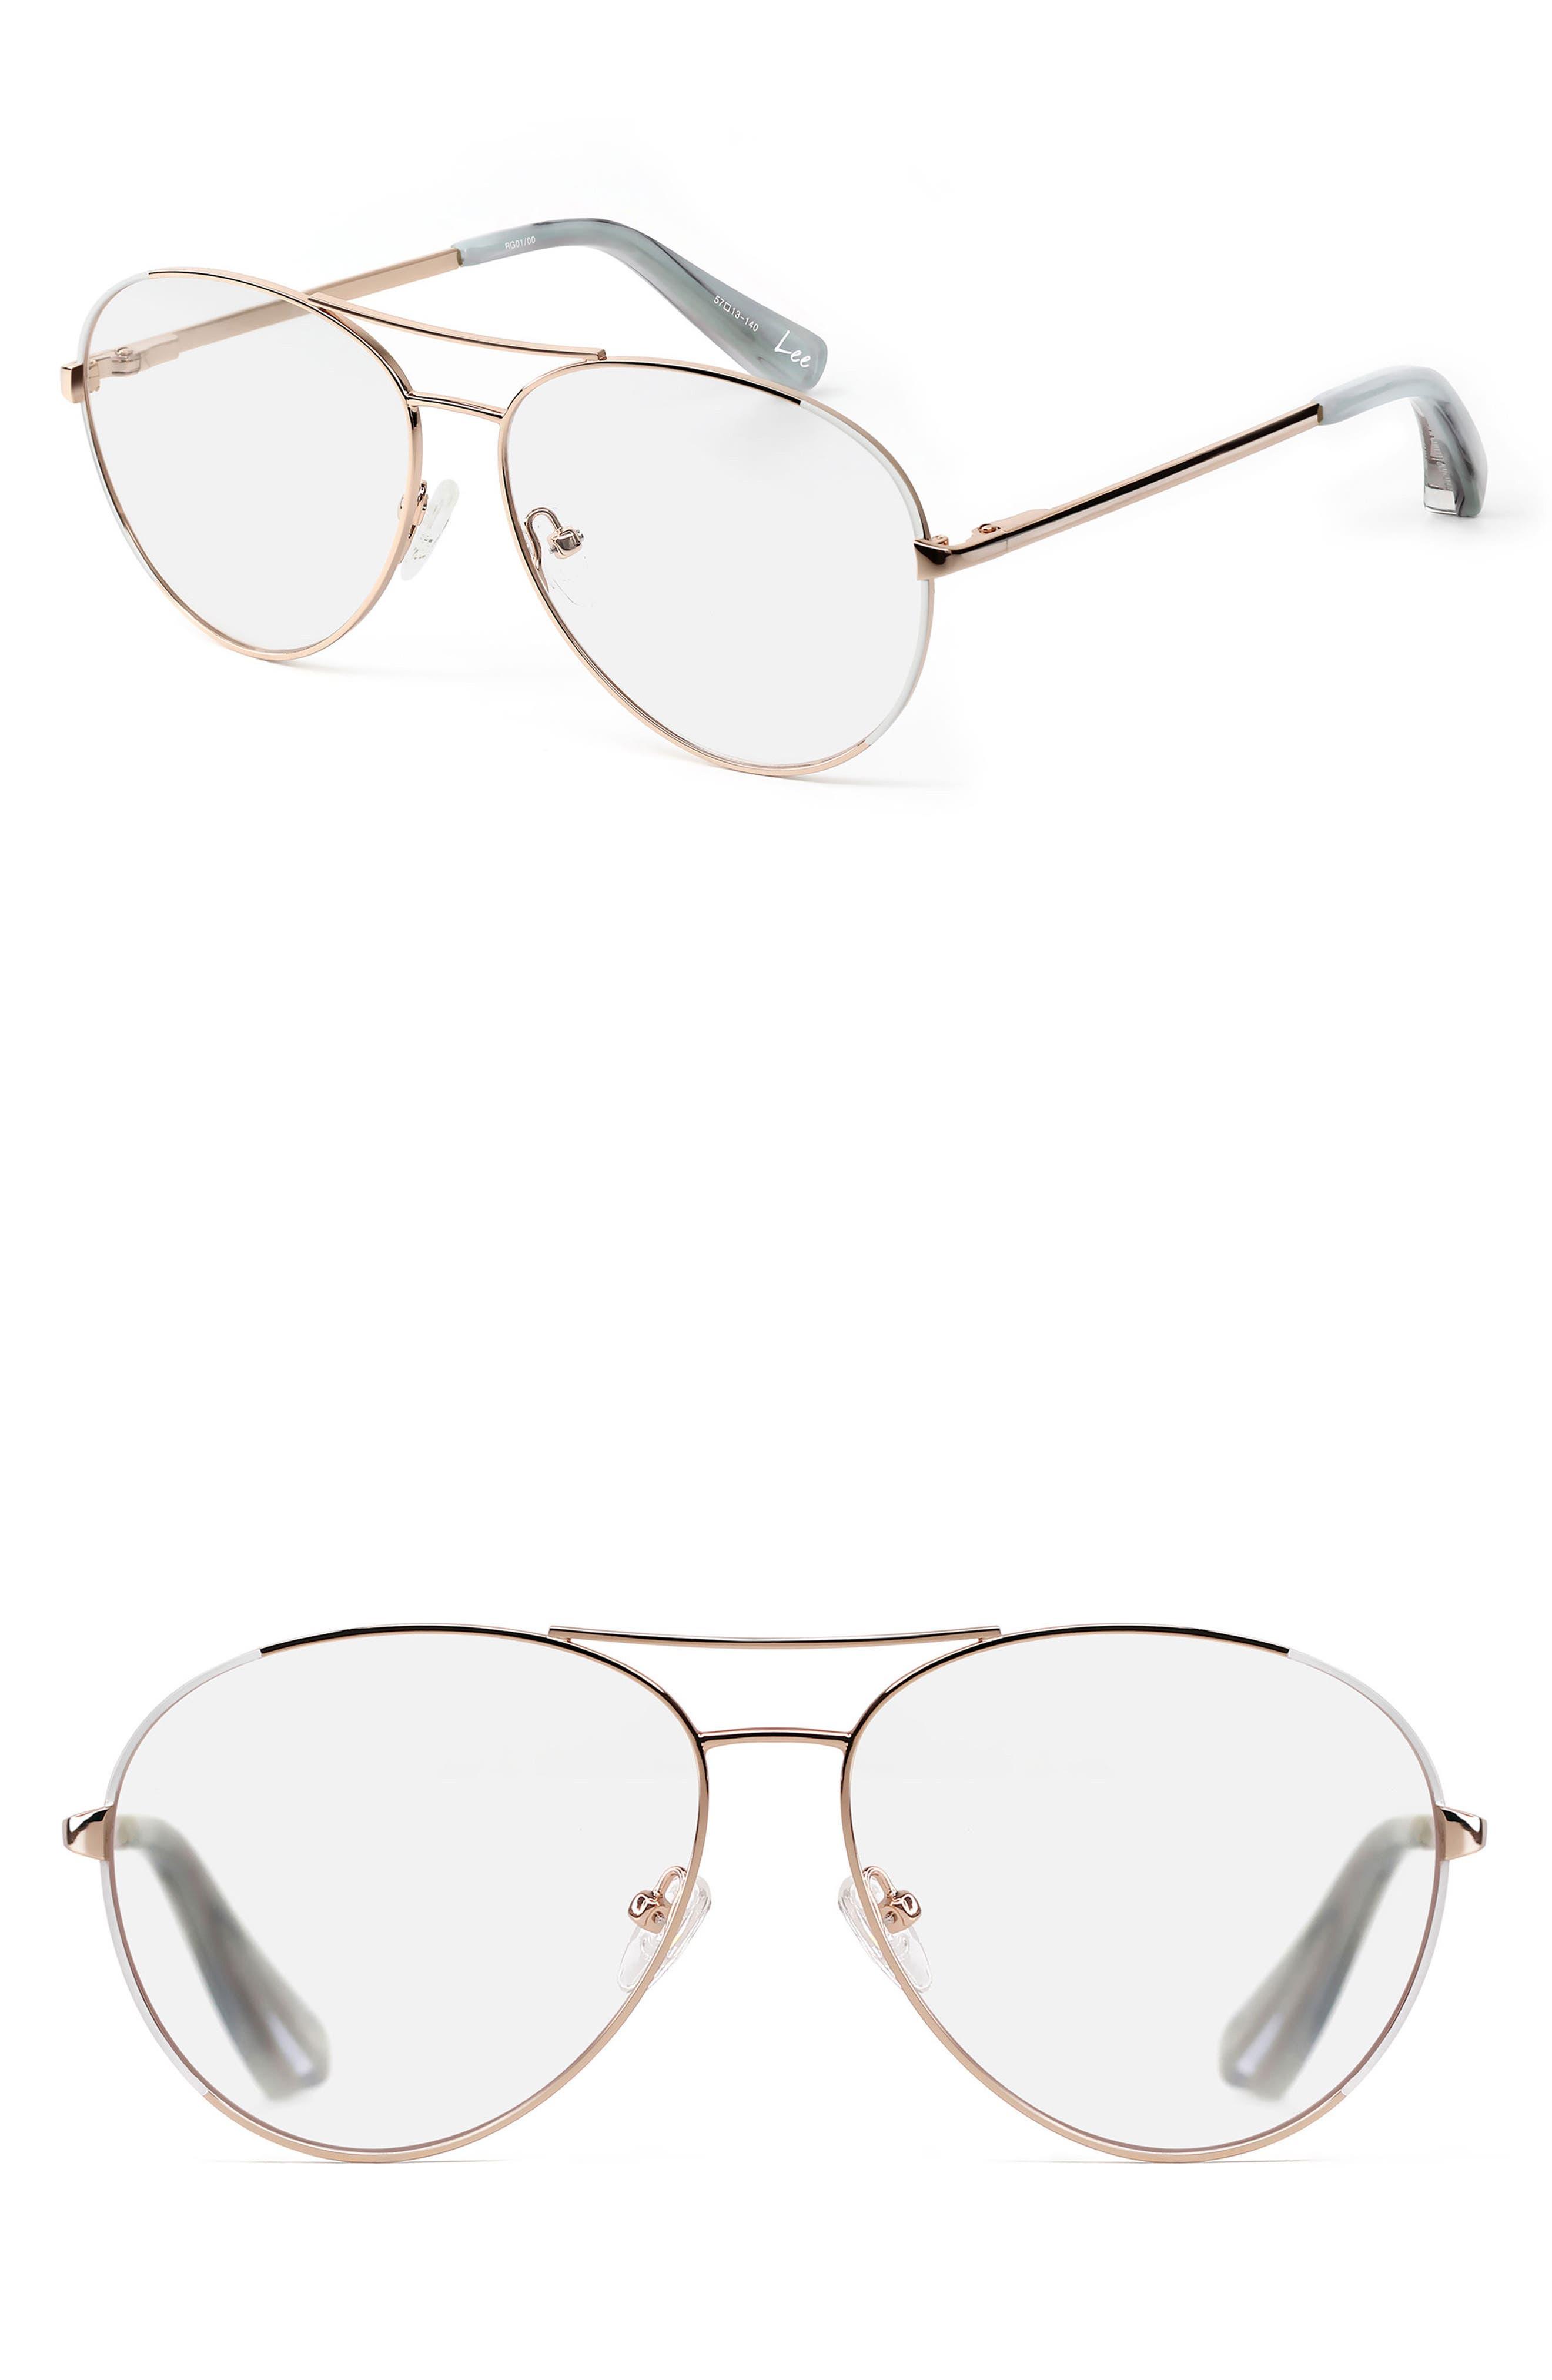 Lee 57mm Aviator Optical Glasses,                         Main,                         color, Rose Gold